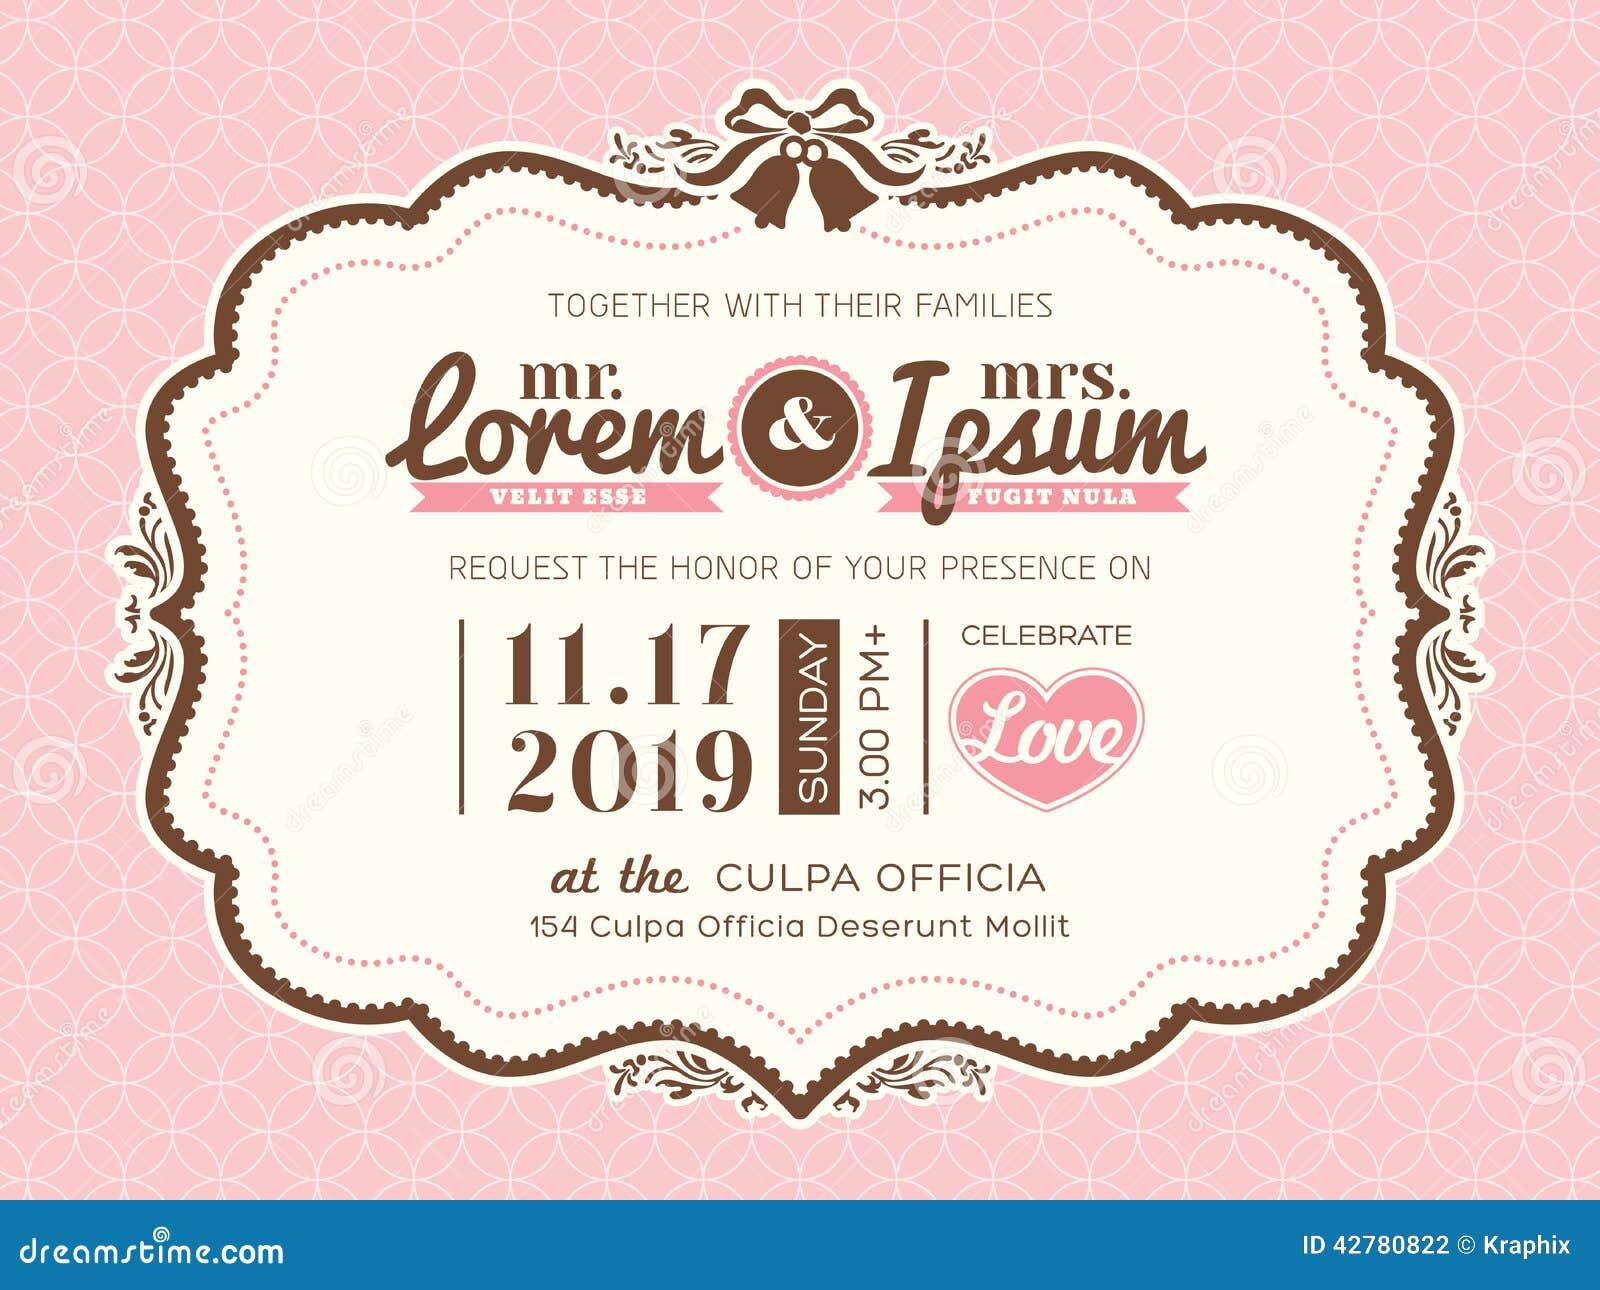 ... Frame Wedding Invitation Card Template Stock Vector - Image: 42780822